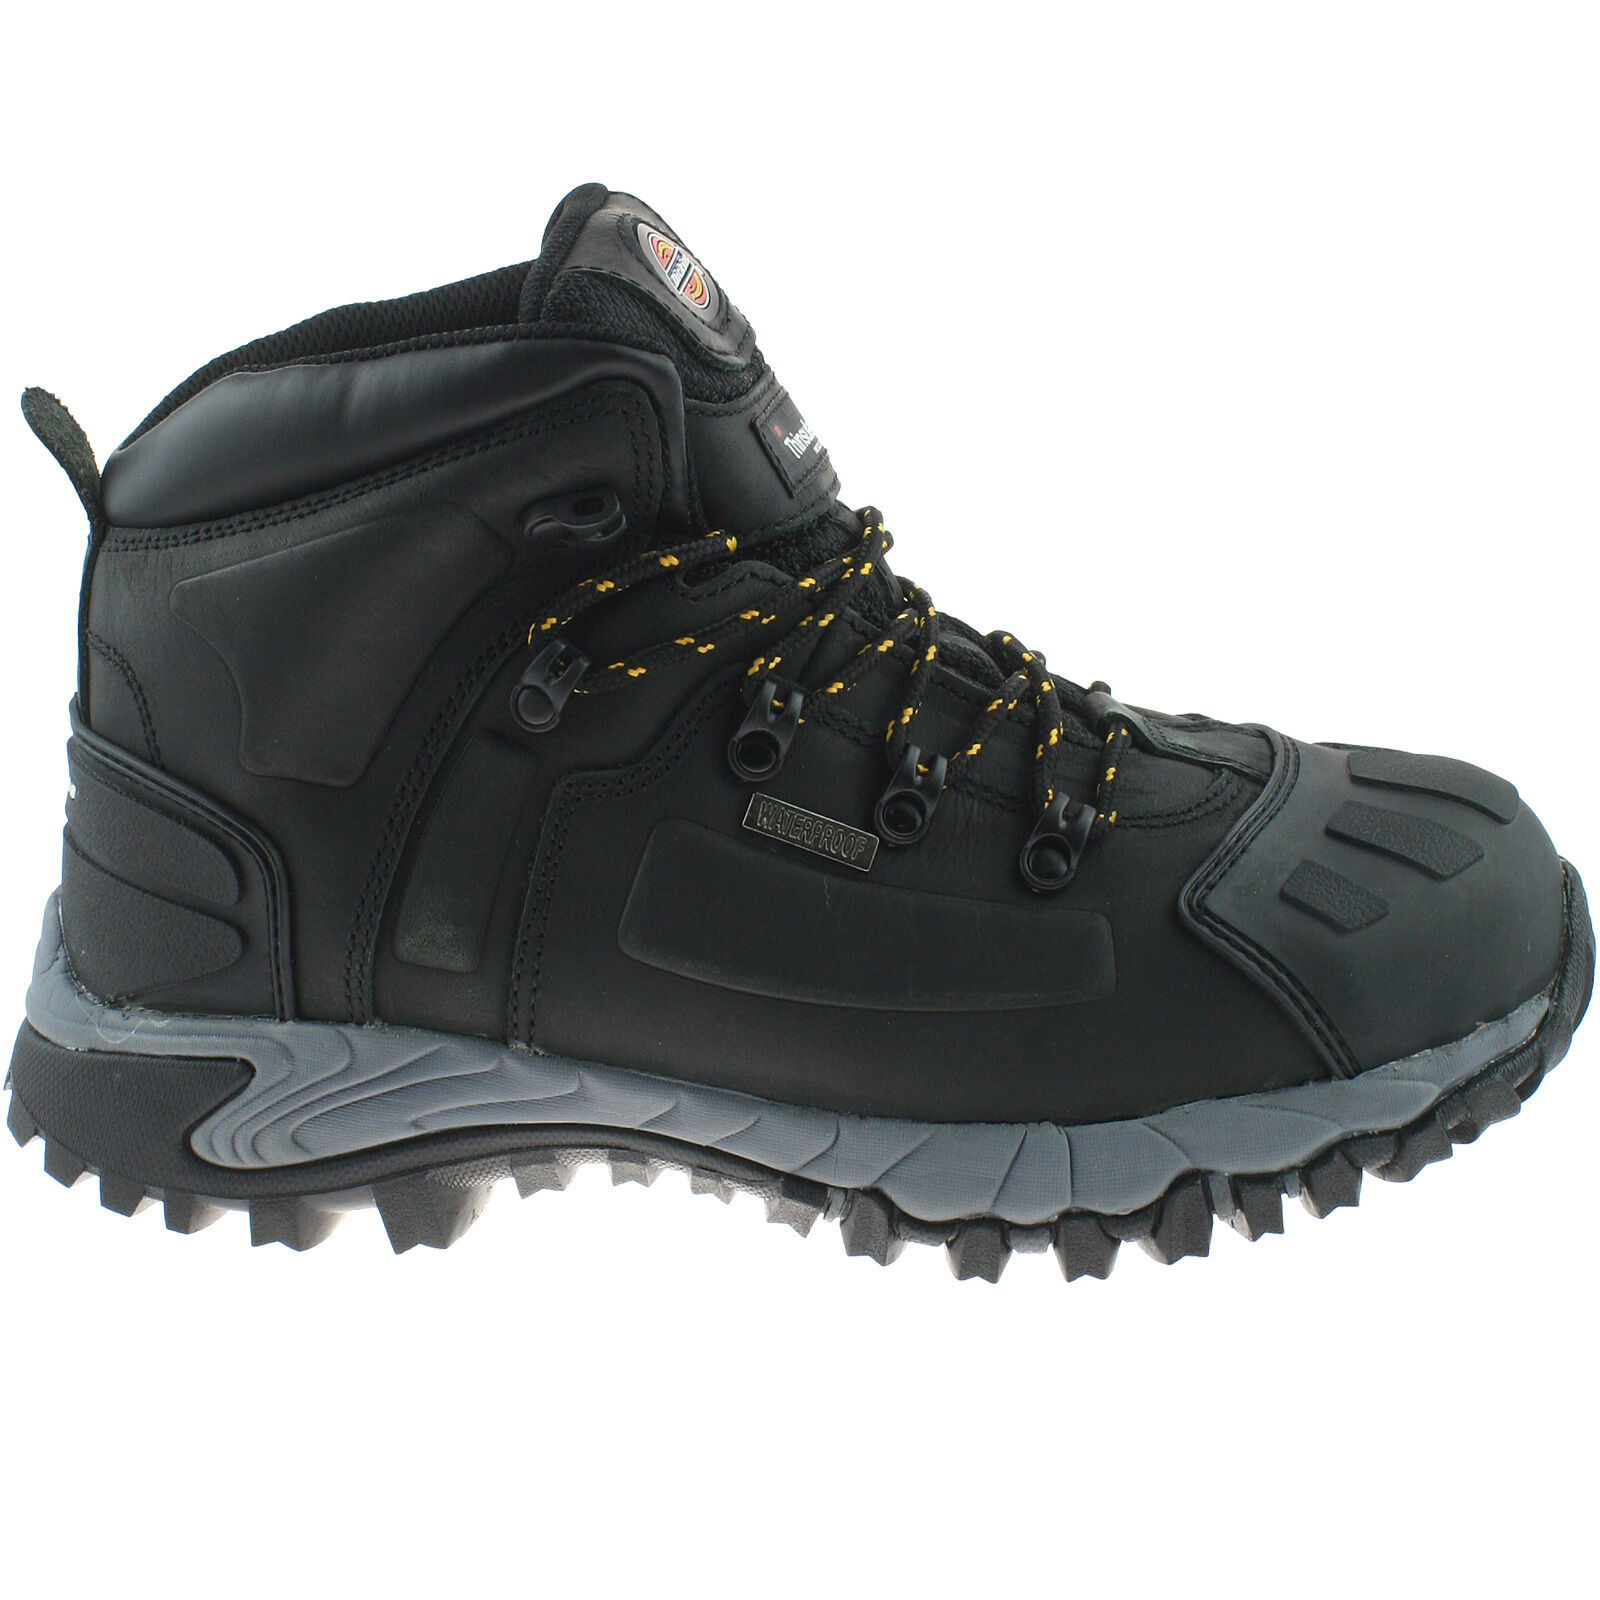 DICKIES MEDWAY BLACK SAFETY Stiefel Stiefel Stiefel SIZE UK 7 EU 41 FD23310 WATERPROOF HIKER fe4c65